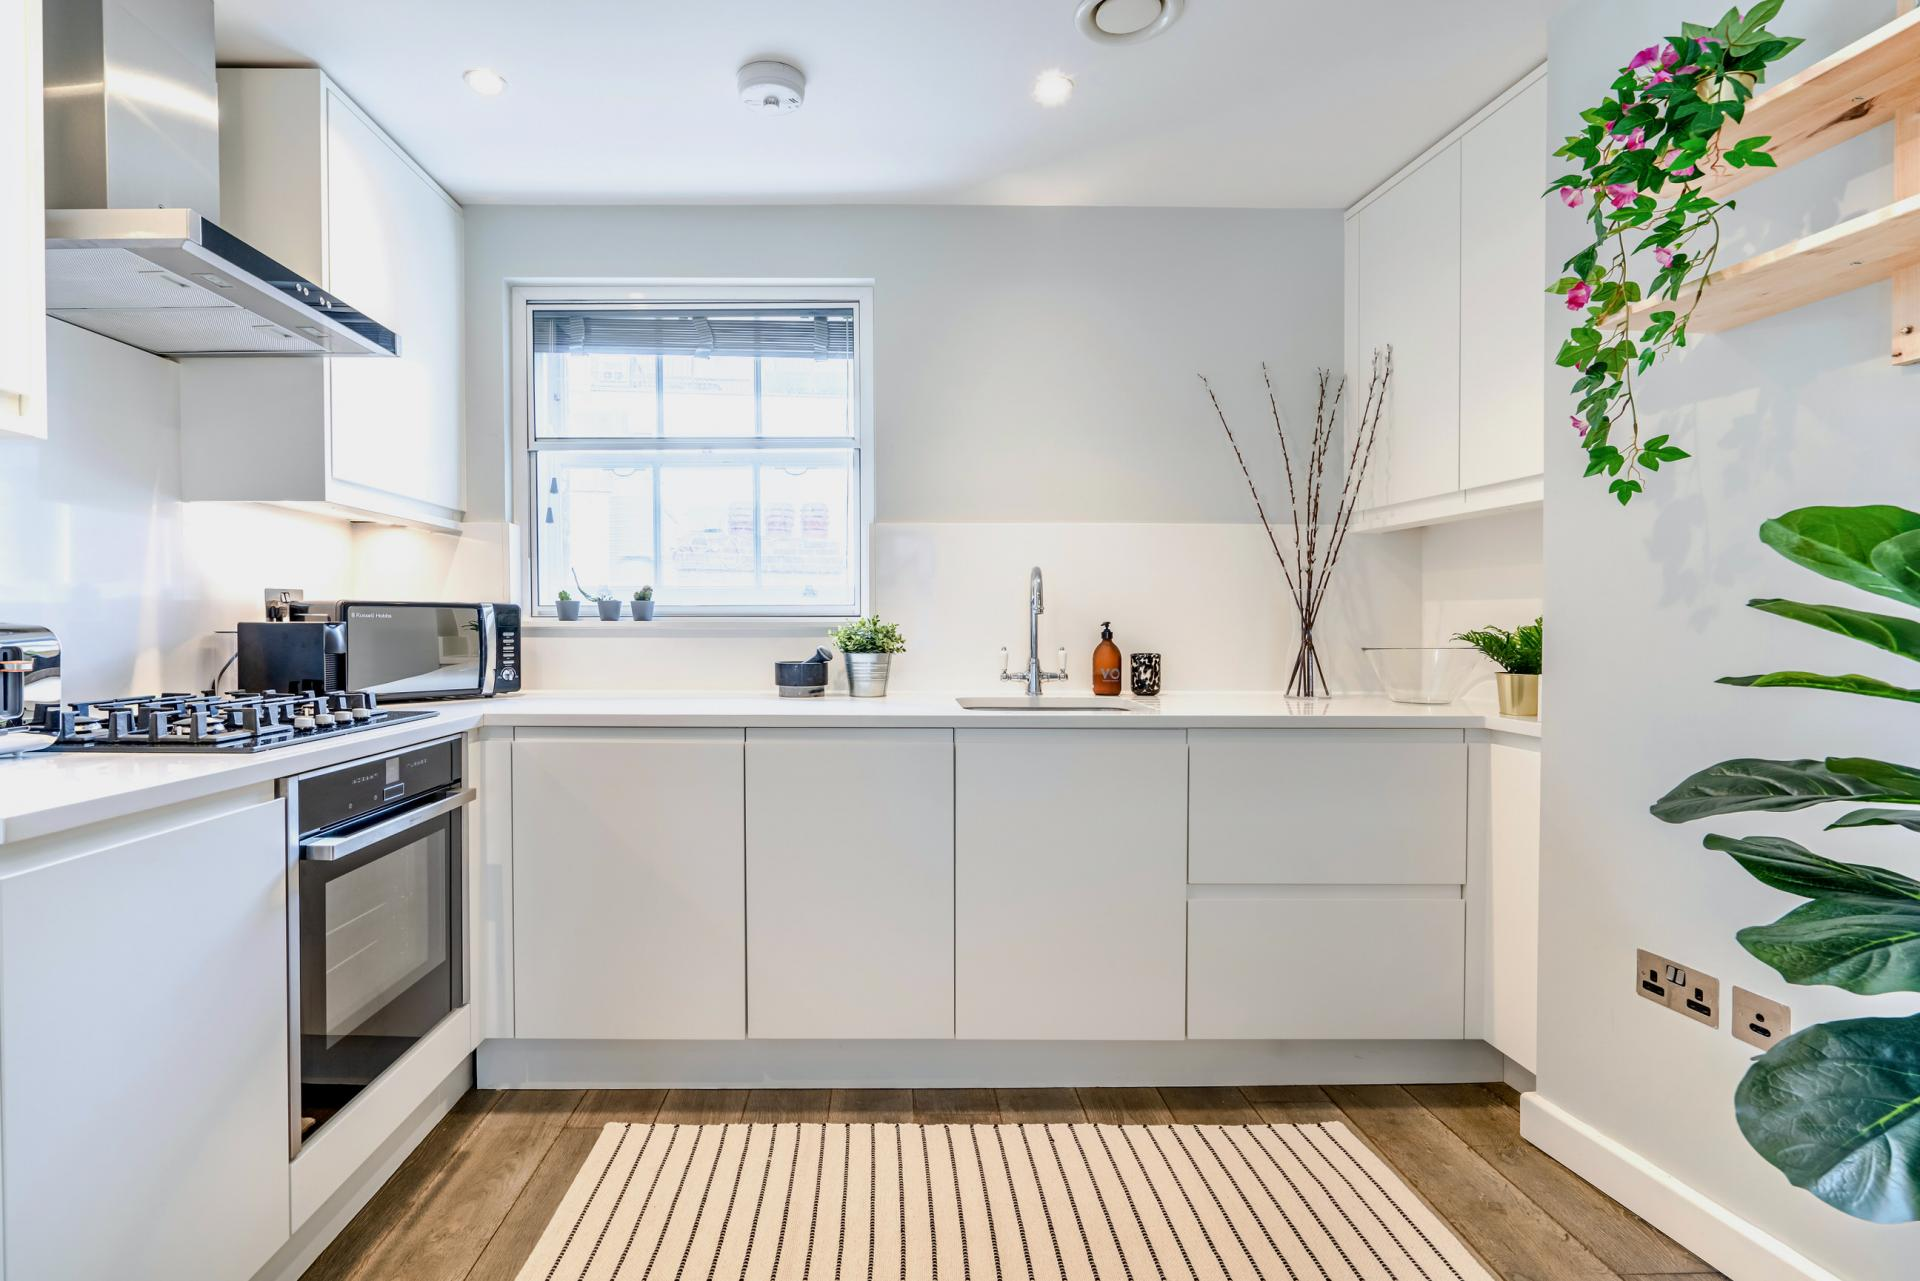 Kitchen at BE: Wardour Street Apartments, Soho, London - Citybase Apartments